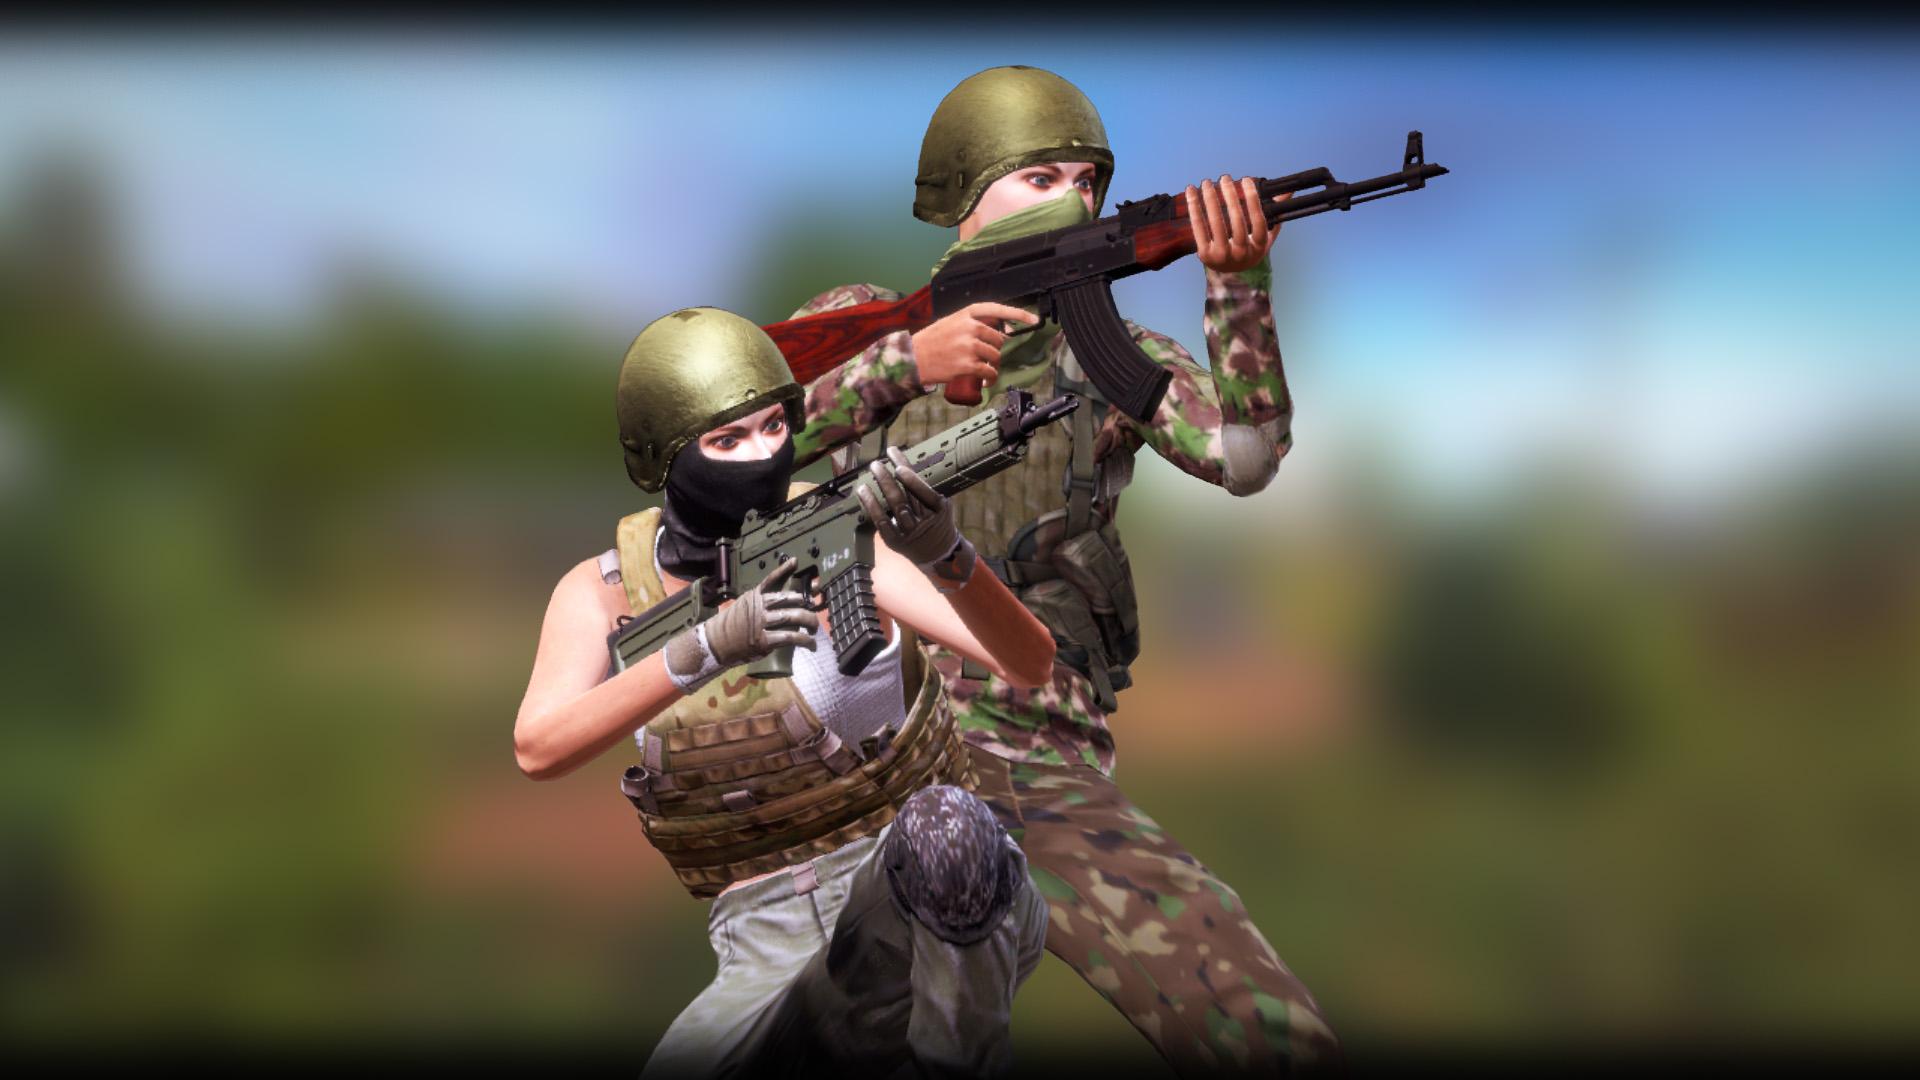 freeman guerrilla warfare weapons